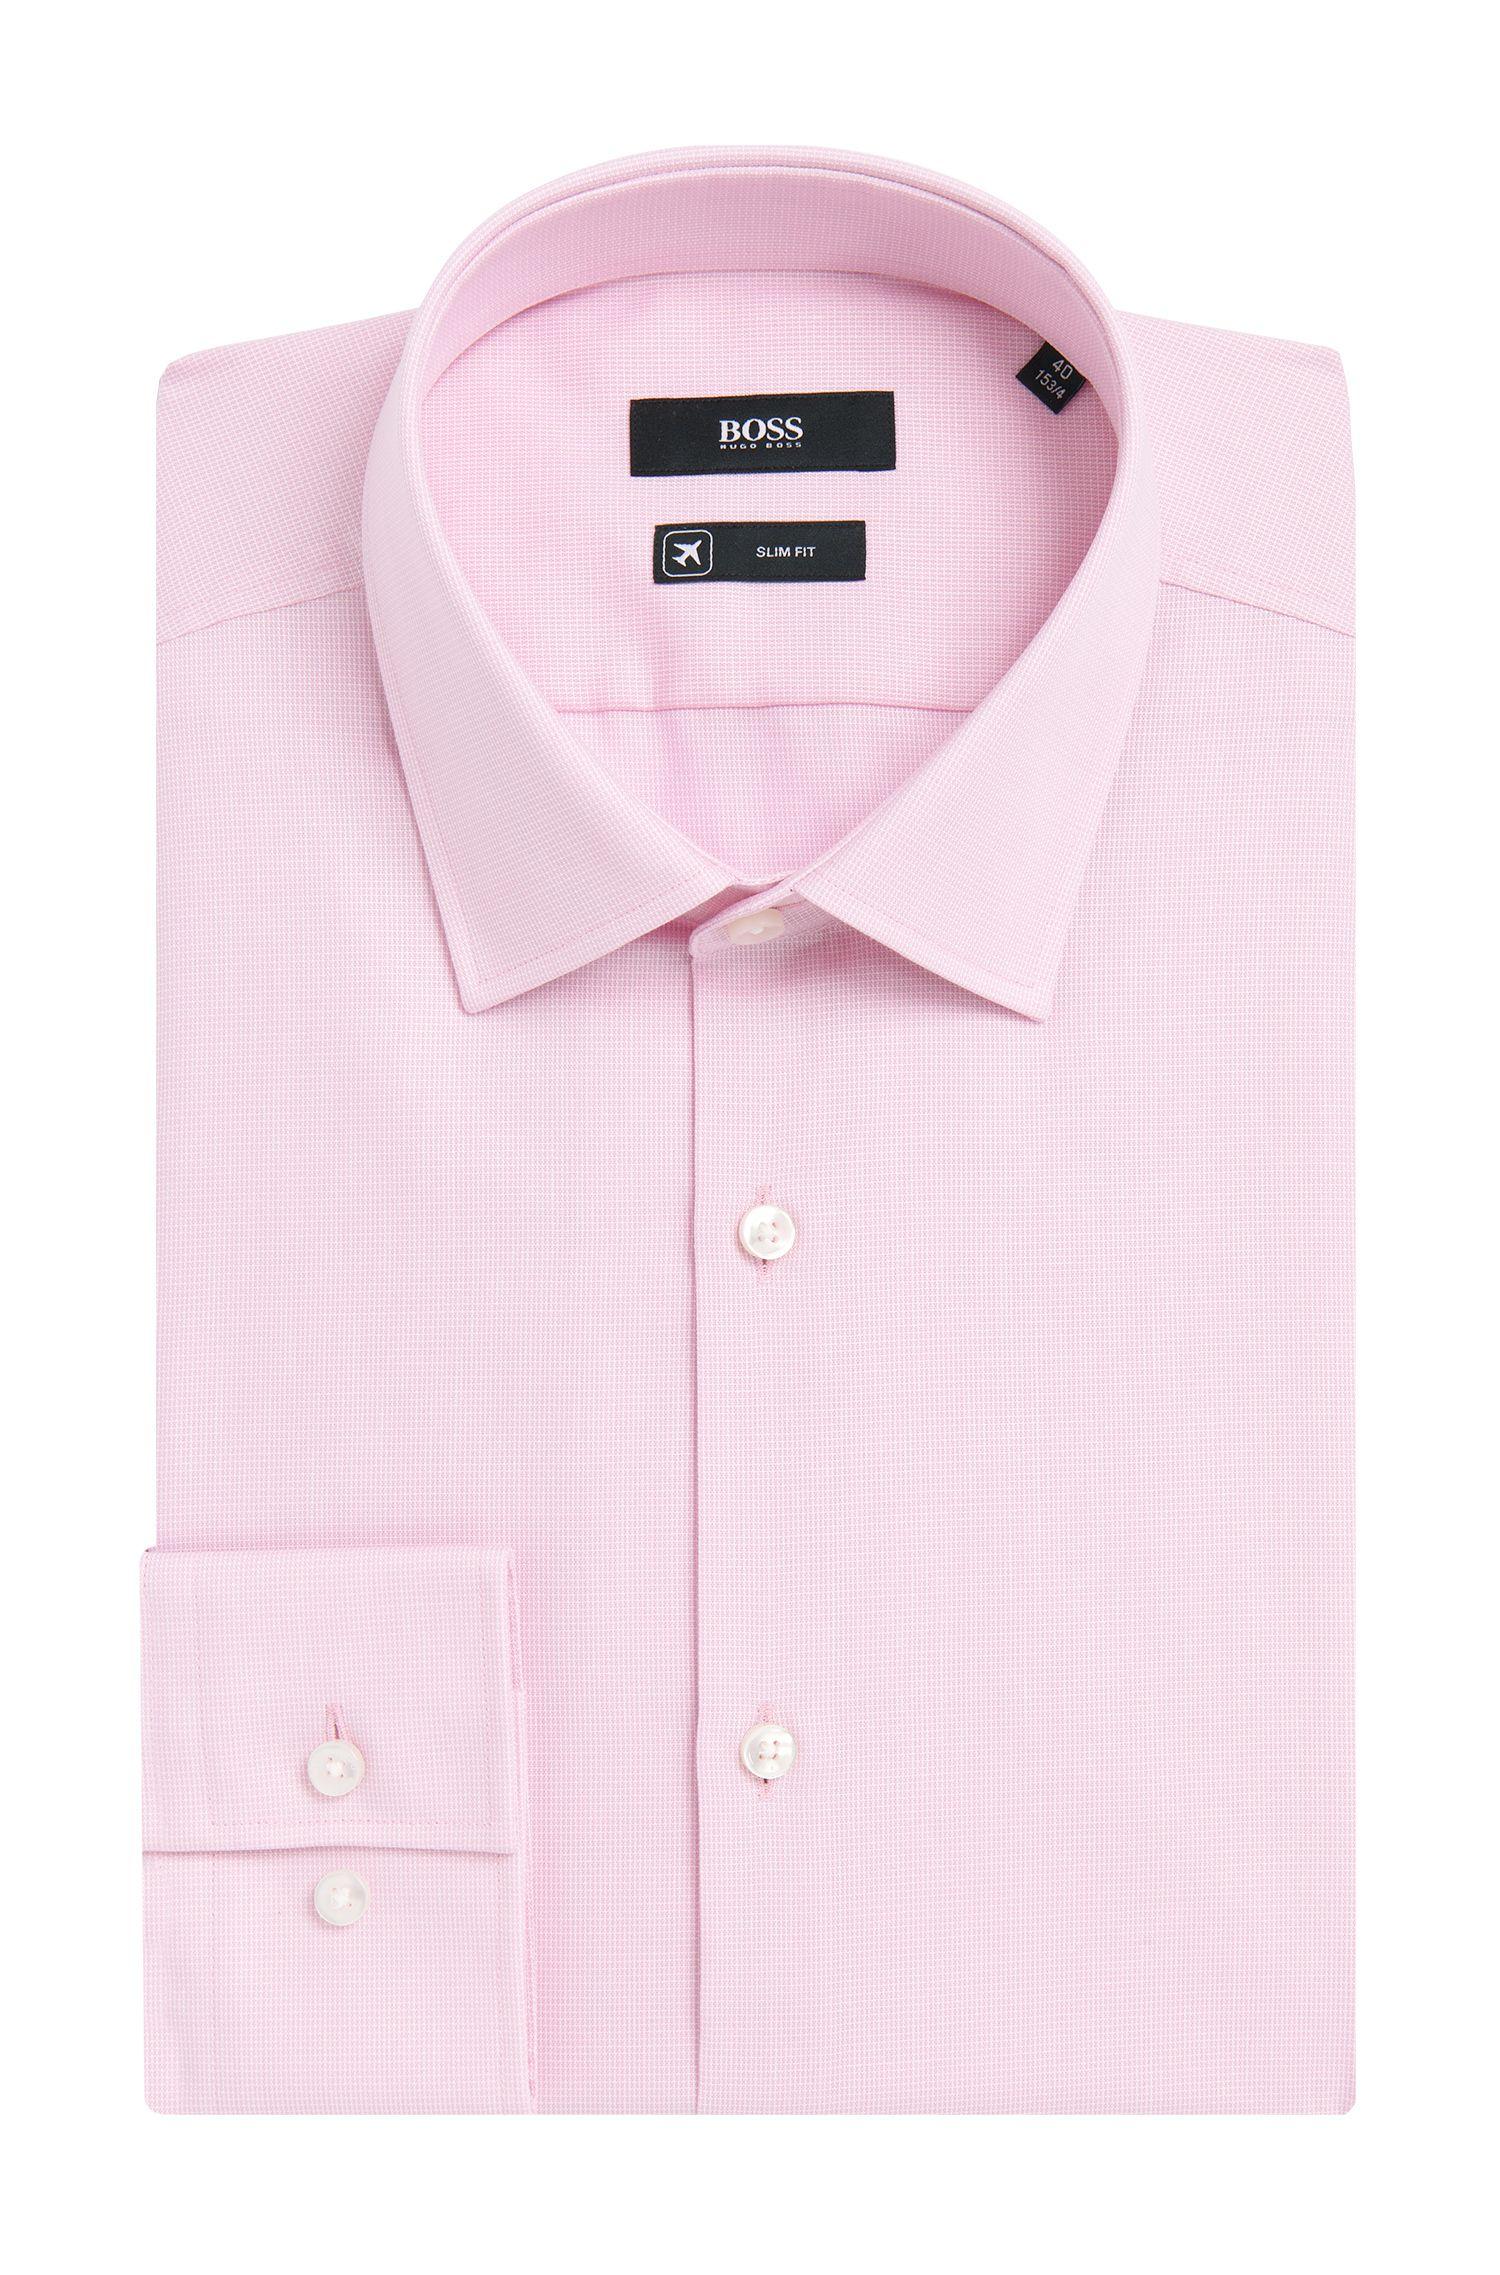 'Jenno' | Slim Fit, Fresh Active Traveler Dress Shirt